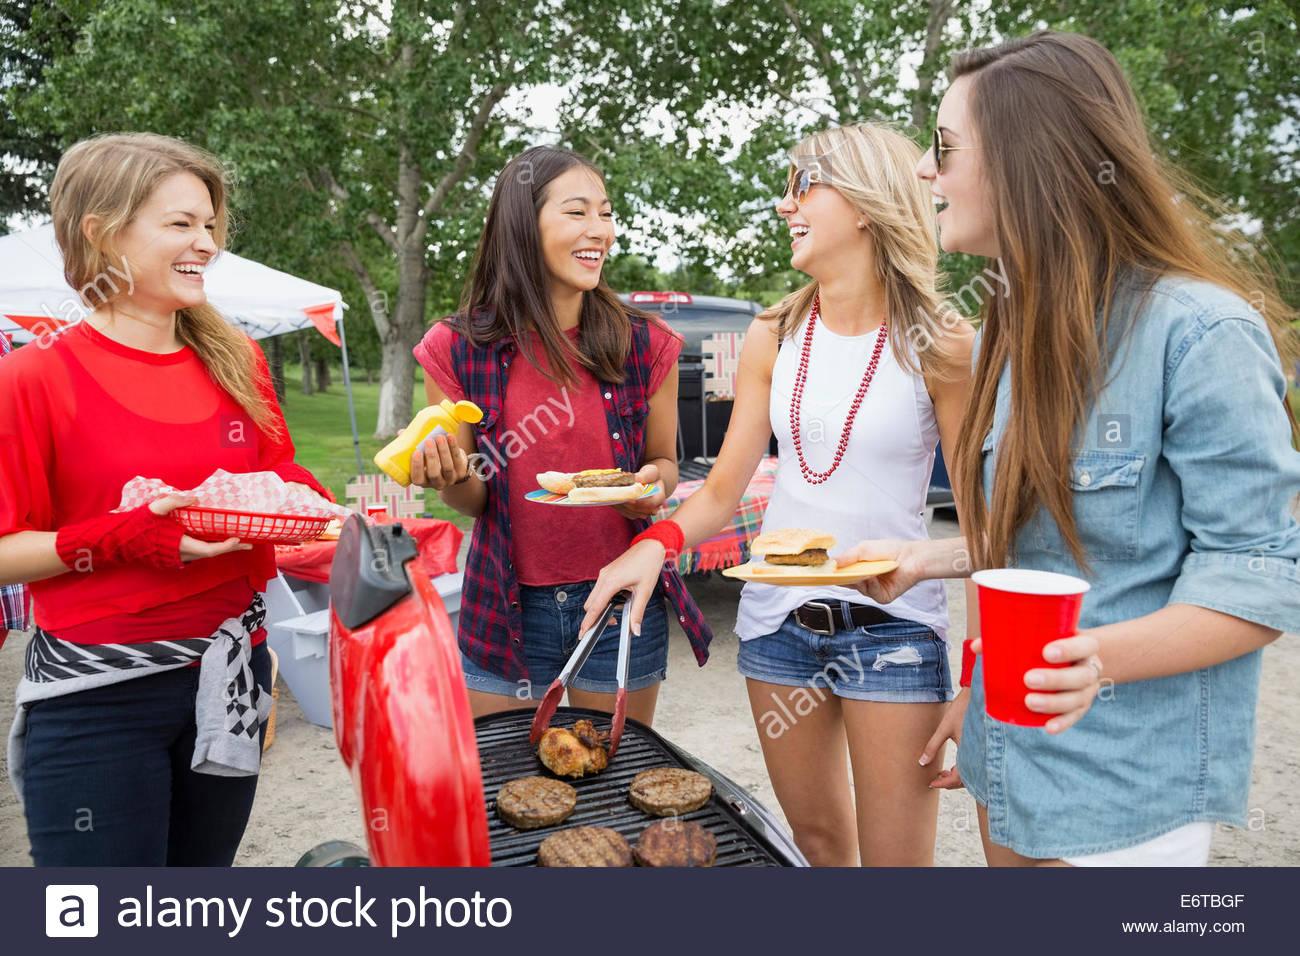 Cuisson au barbecue femmes hayon au champ Photo Stock